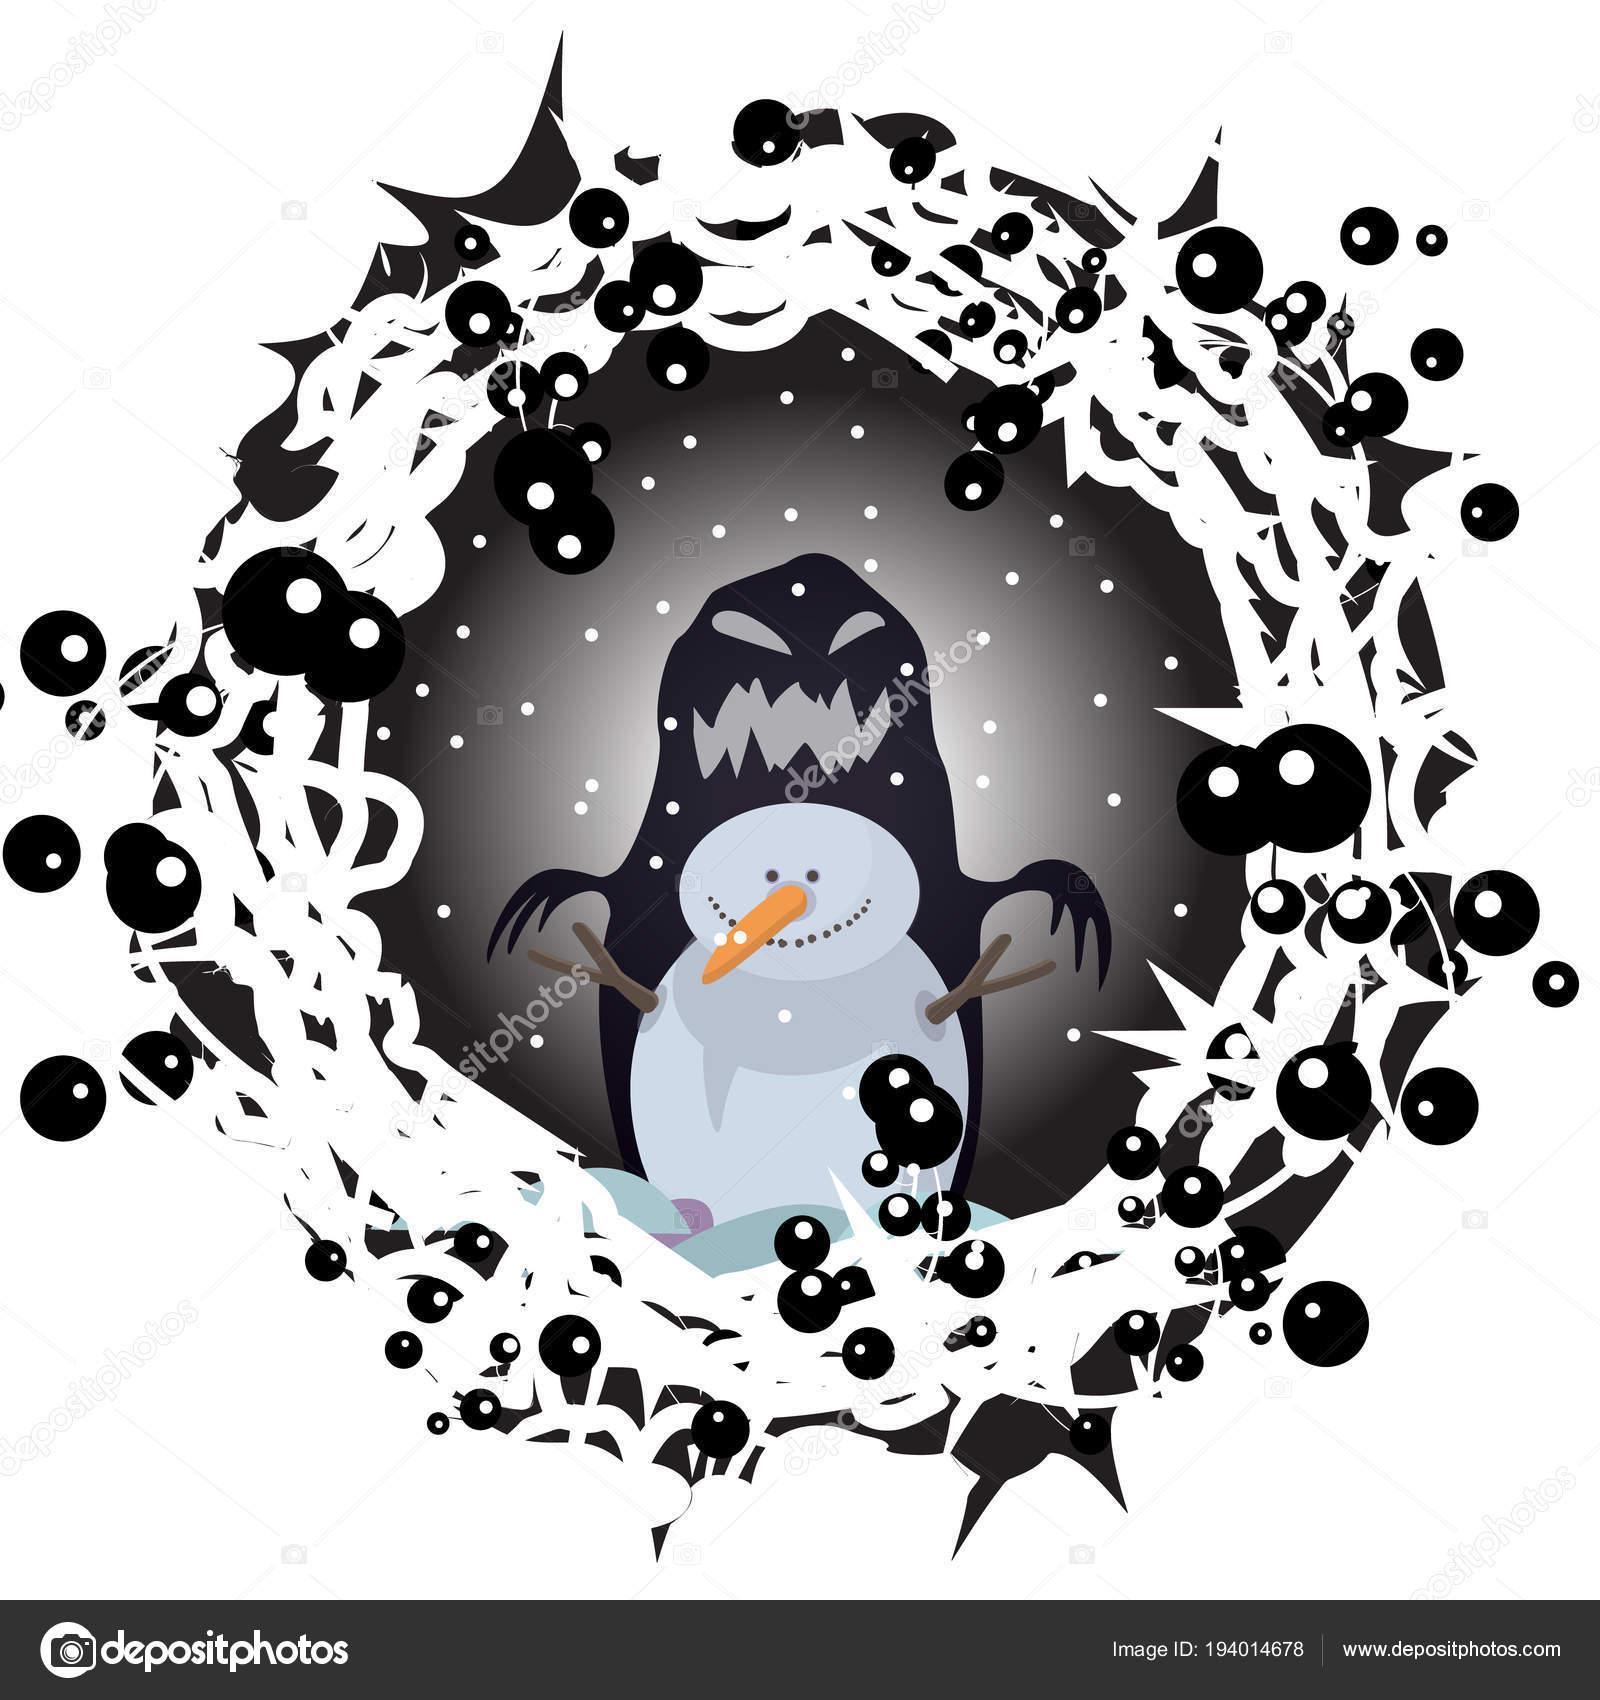 snowman night winter halloween character cartoon animation print